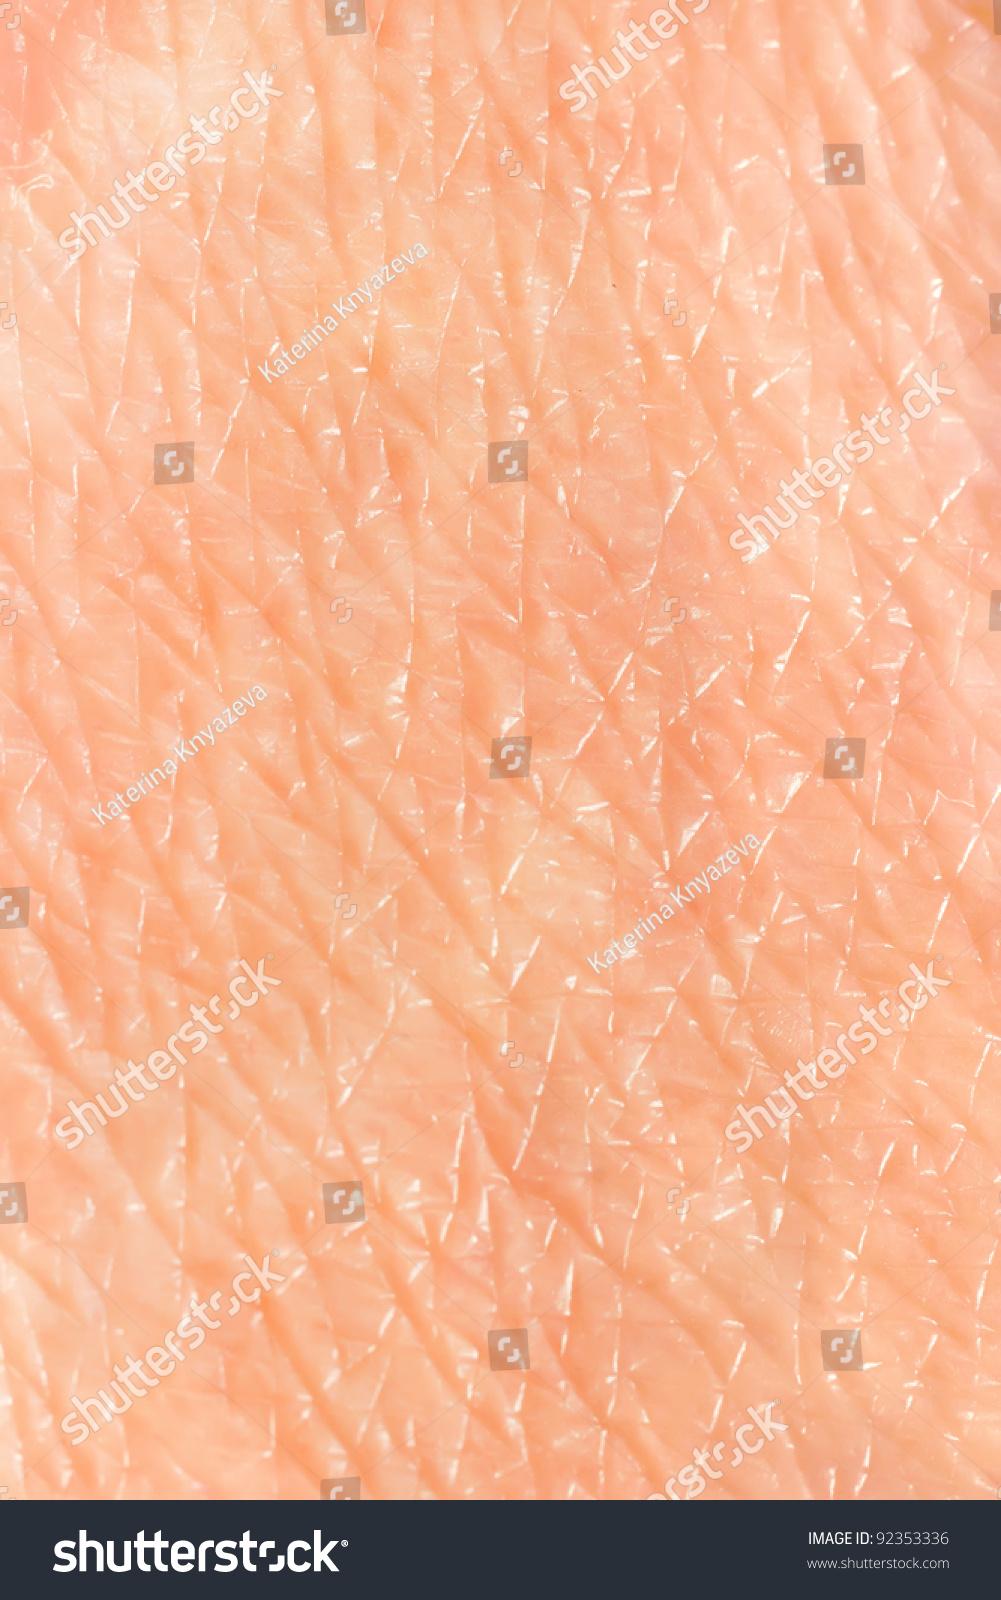 skin background stock photo 92353336 skin background stock photo 92353336